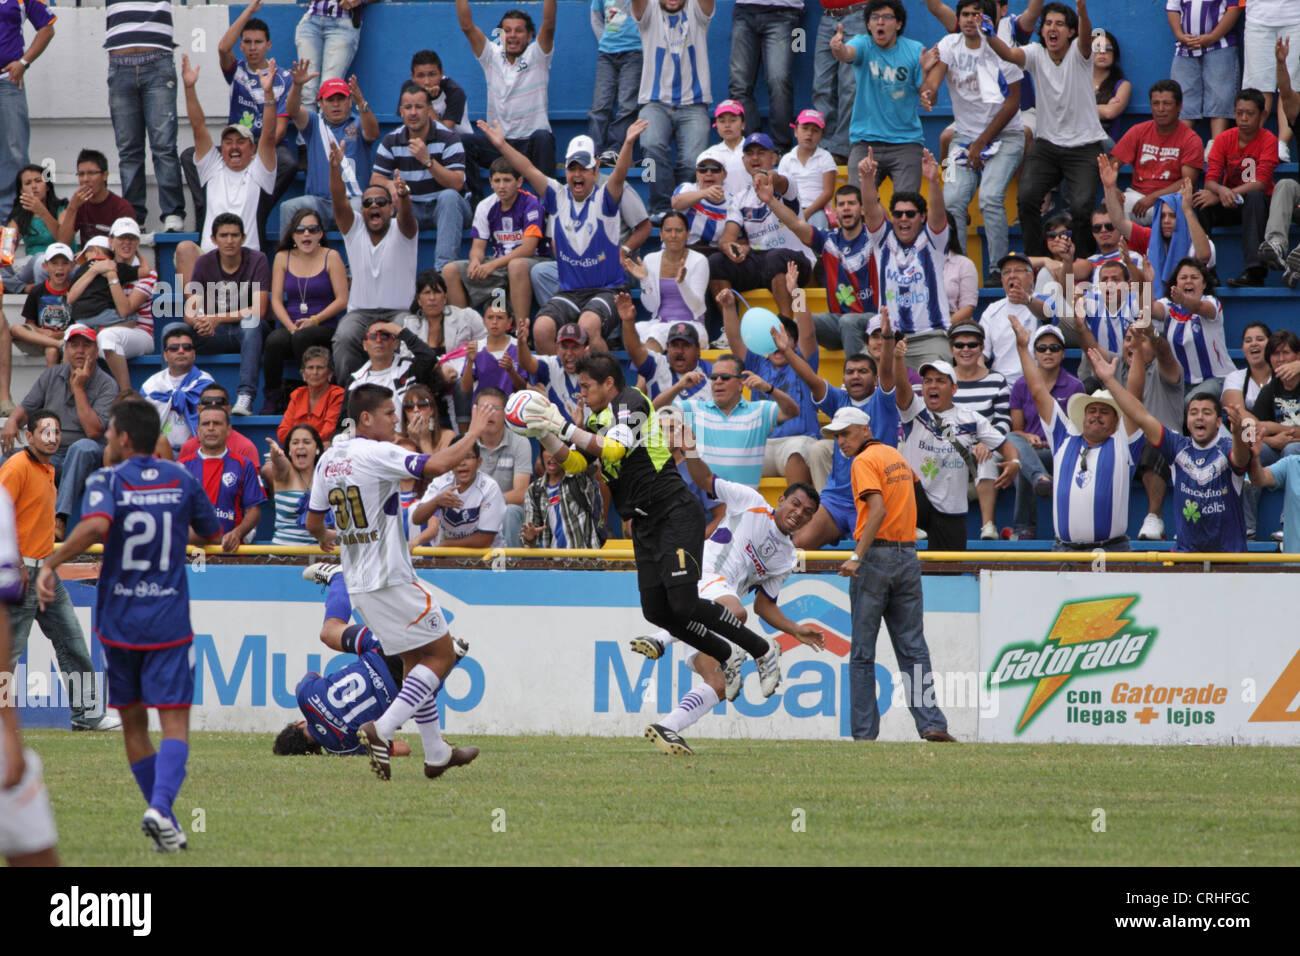 Football / soccer match between Saprissa and Cartago in the Cartago stadium, Costa Rica. - Stock Image